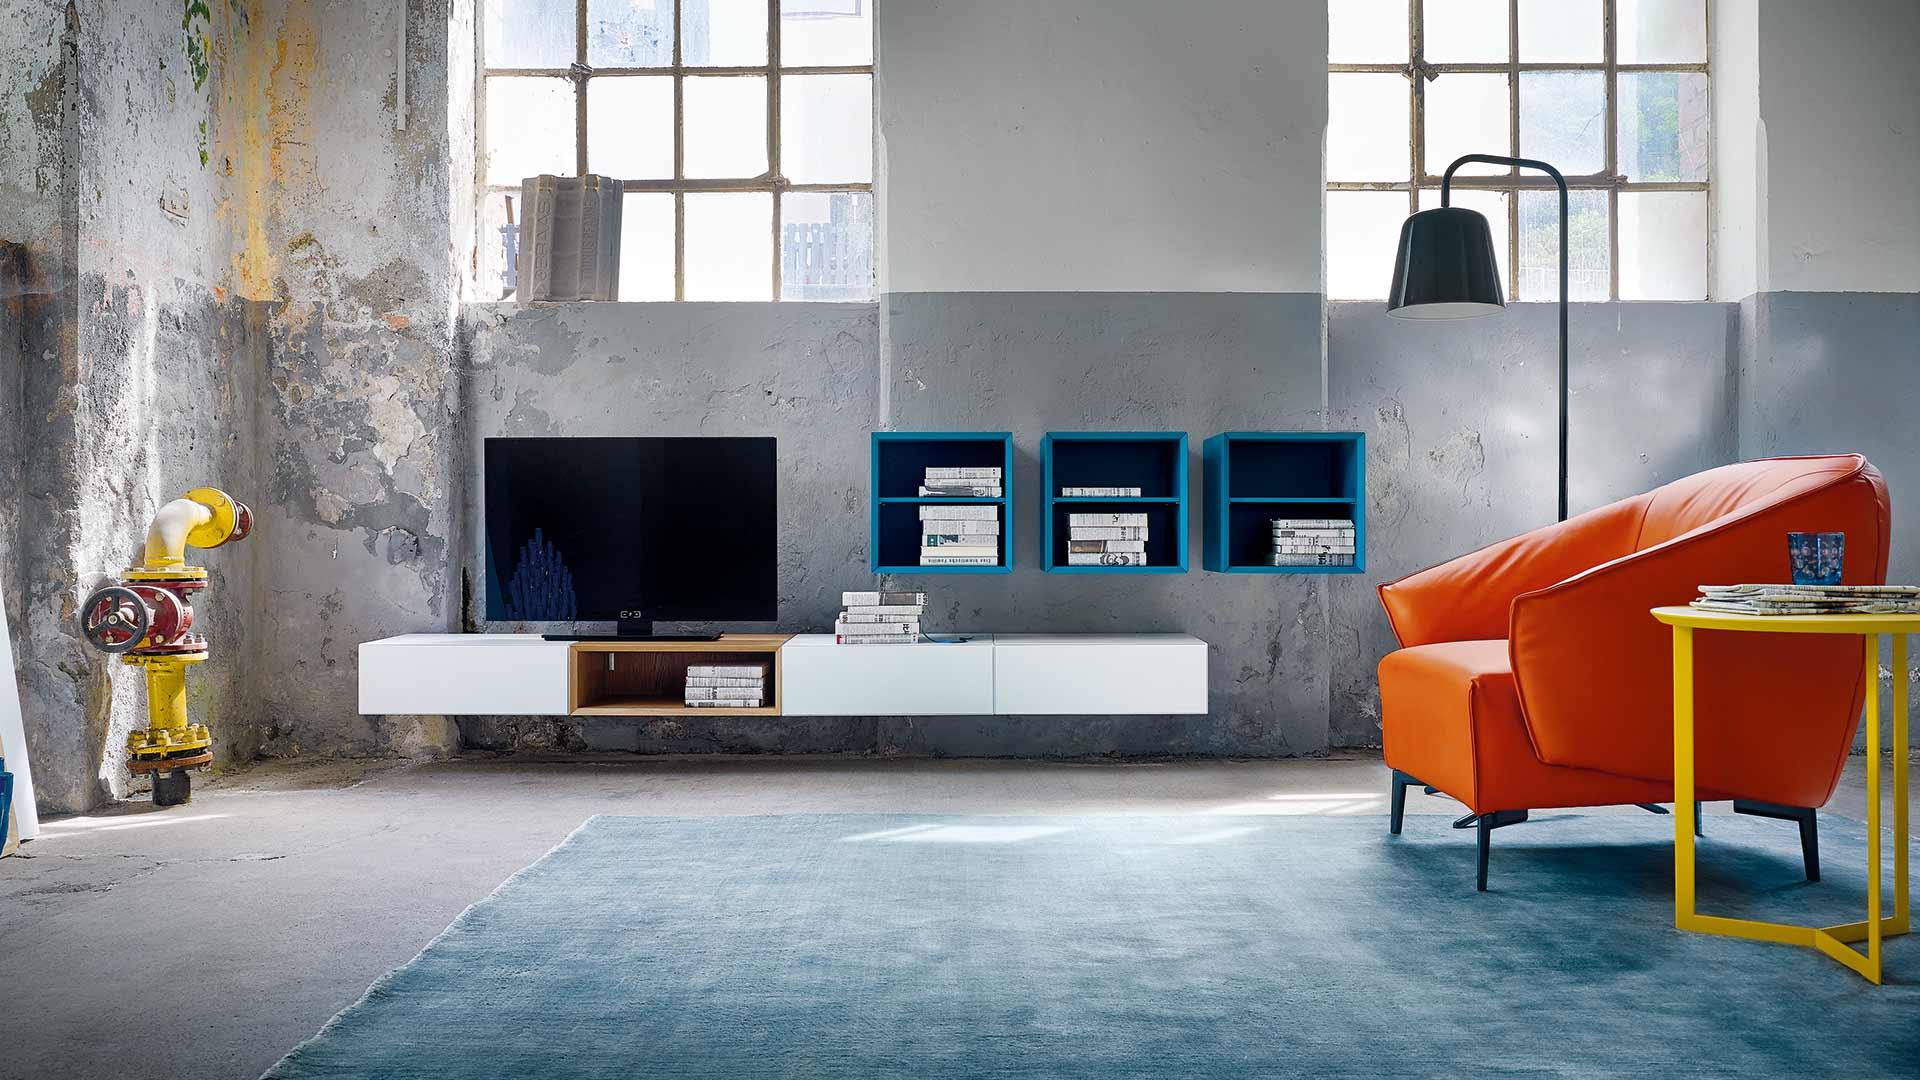 Das Wohnzimmer Backnang | Contur 5600 Von Contur Einrichtungen In Backnang Nahe Stuttgart